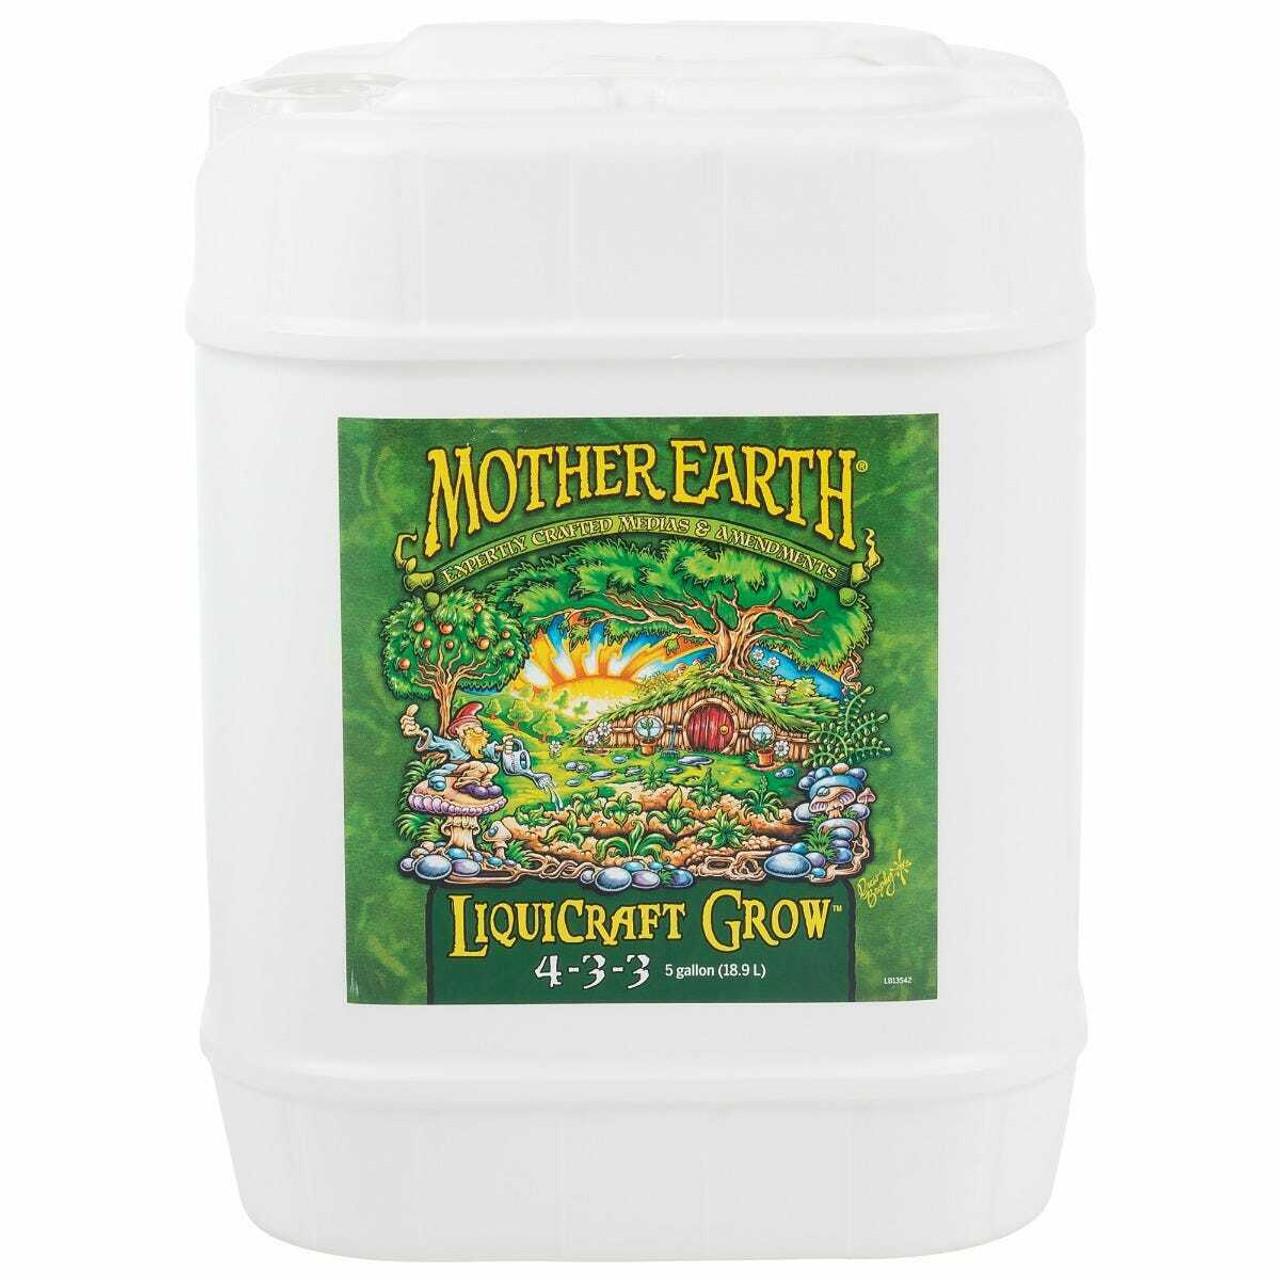 Mother Earth LiquiCraft Grow 4-3-3 5Gal